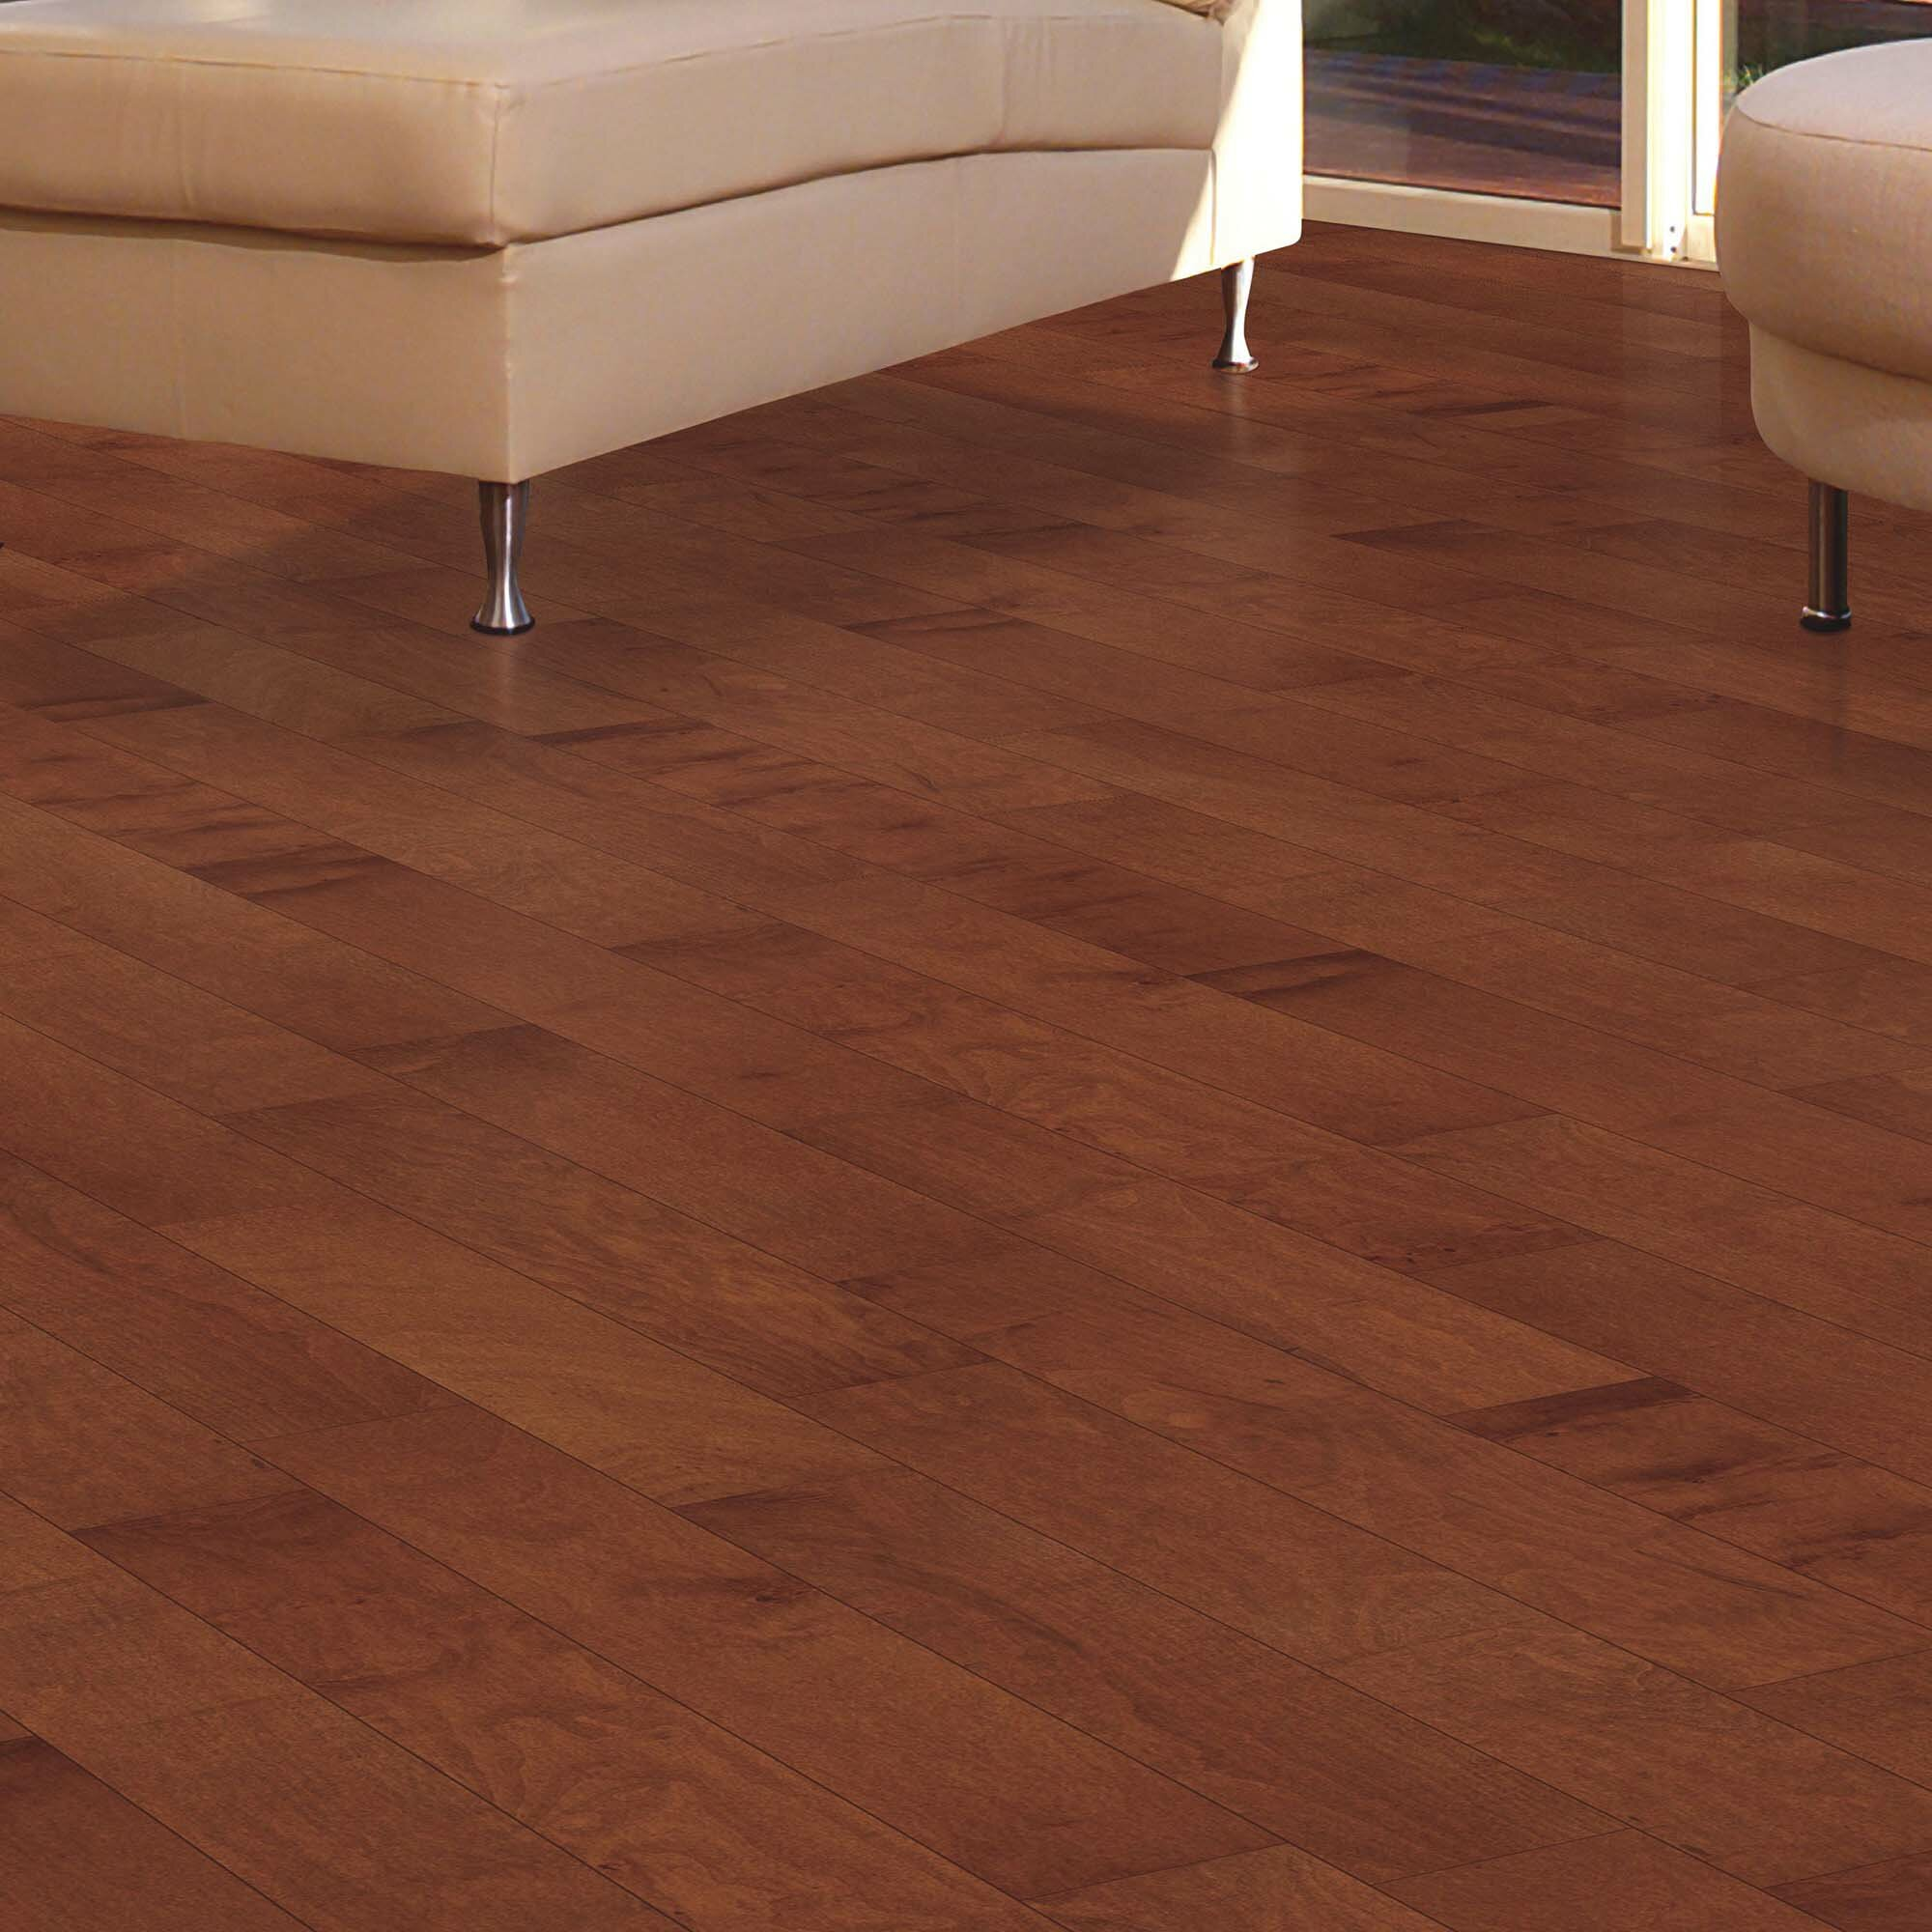 Mohawk Randhurst Maple 3 8 Thick X 5 Wide X Varying Length Engineered Hardwood Flooring Wayfair